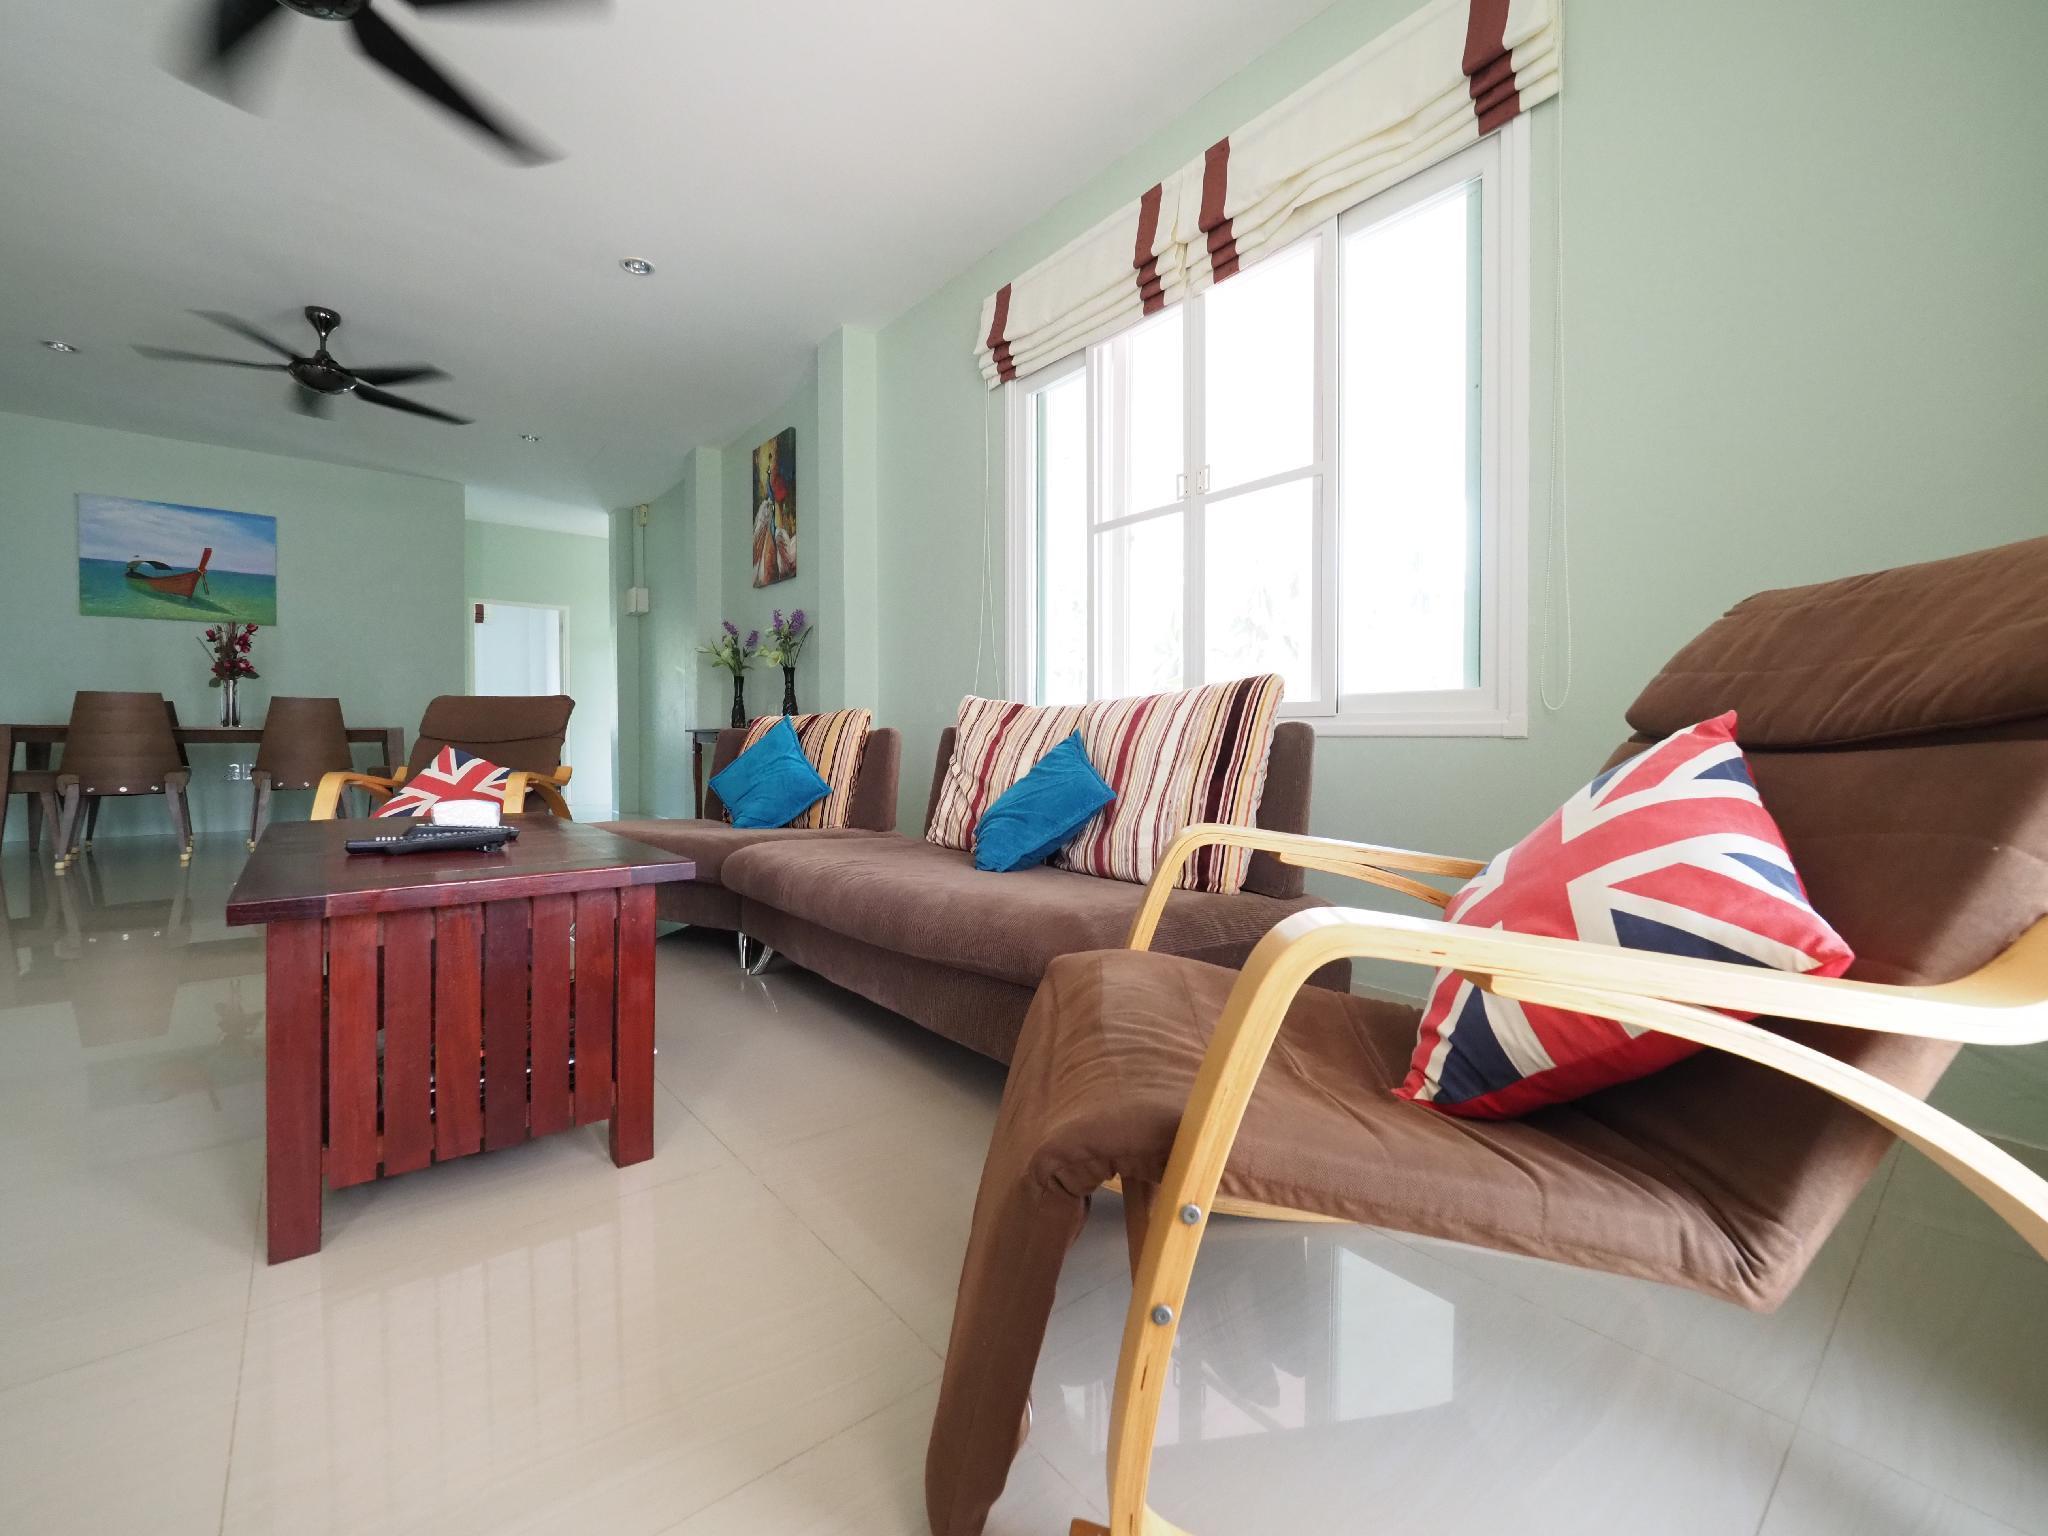 Coco Pool Villa Bangsaphan วิลลา 3 ห้องนอน 2 ห้องน้ำส่วนตัว ขนาด 800 ตร.ม. – บางสะพาน